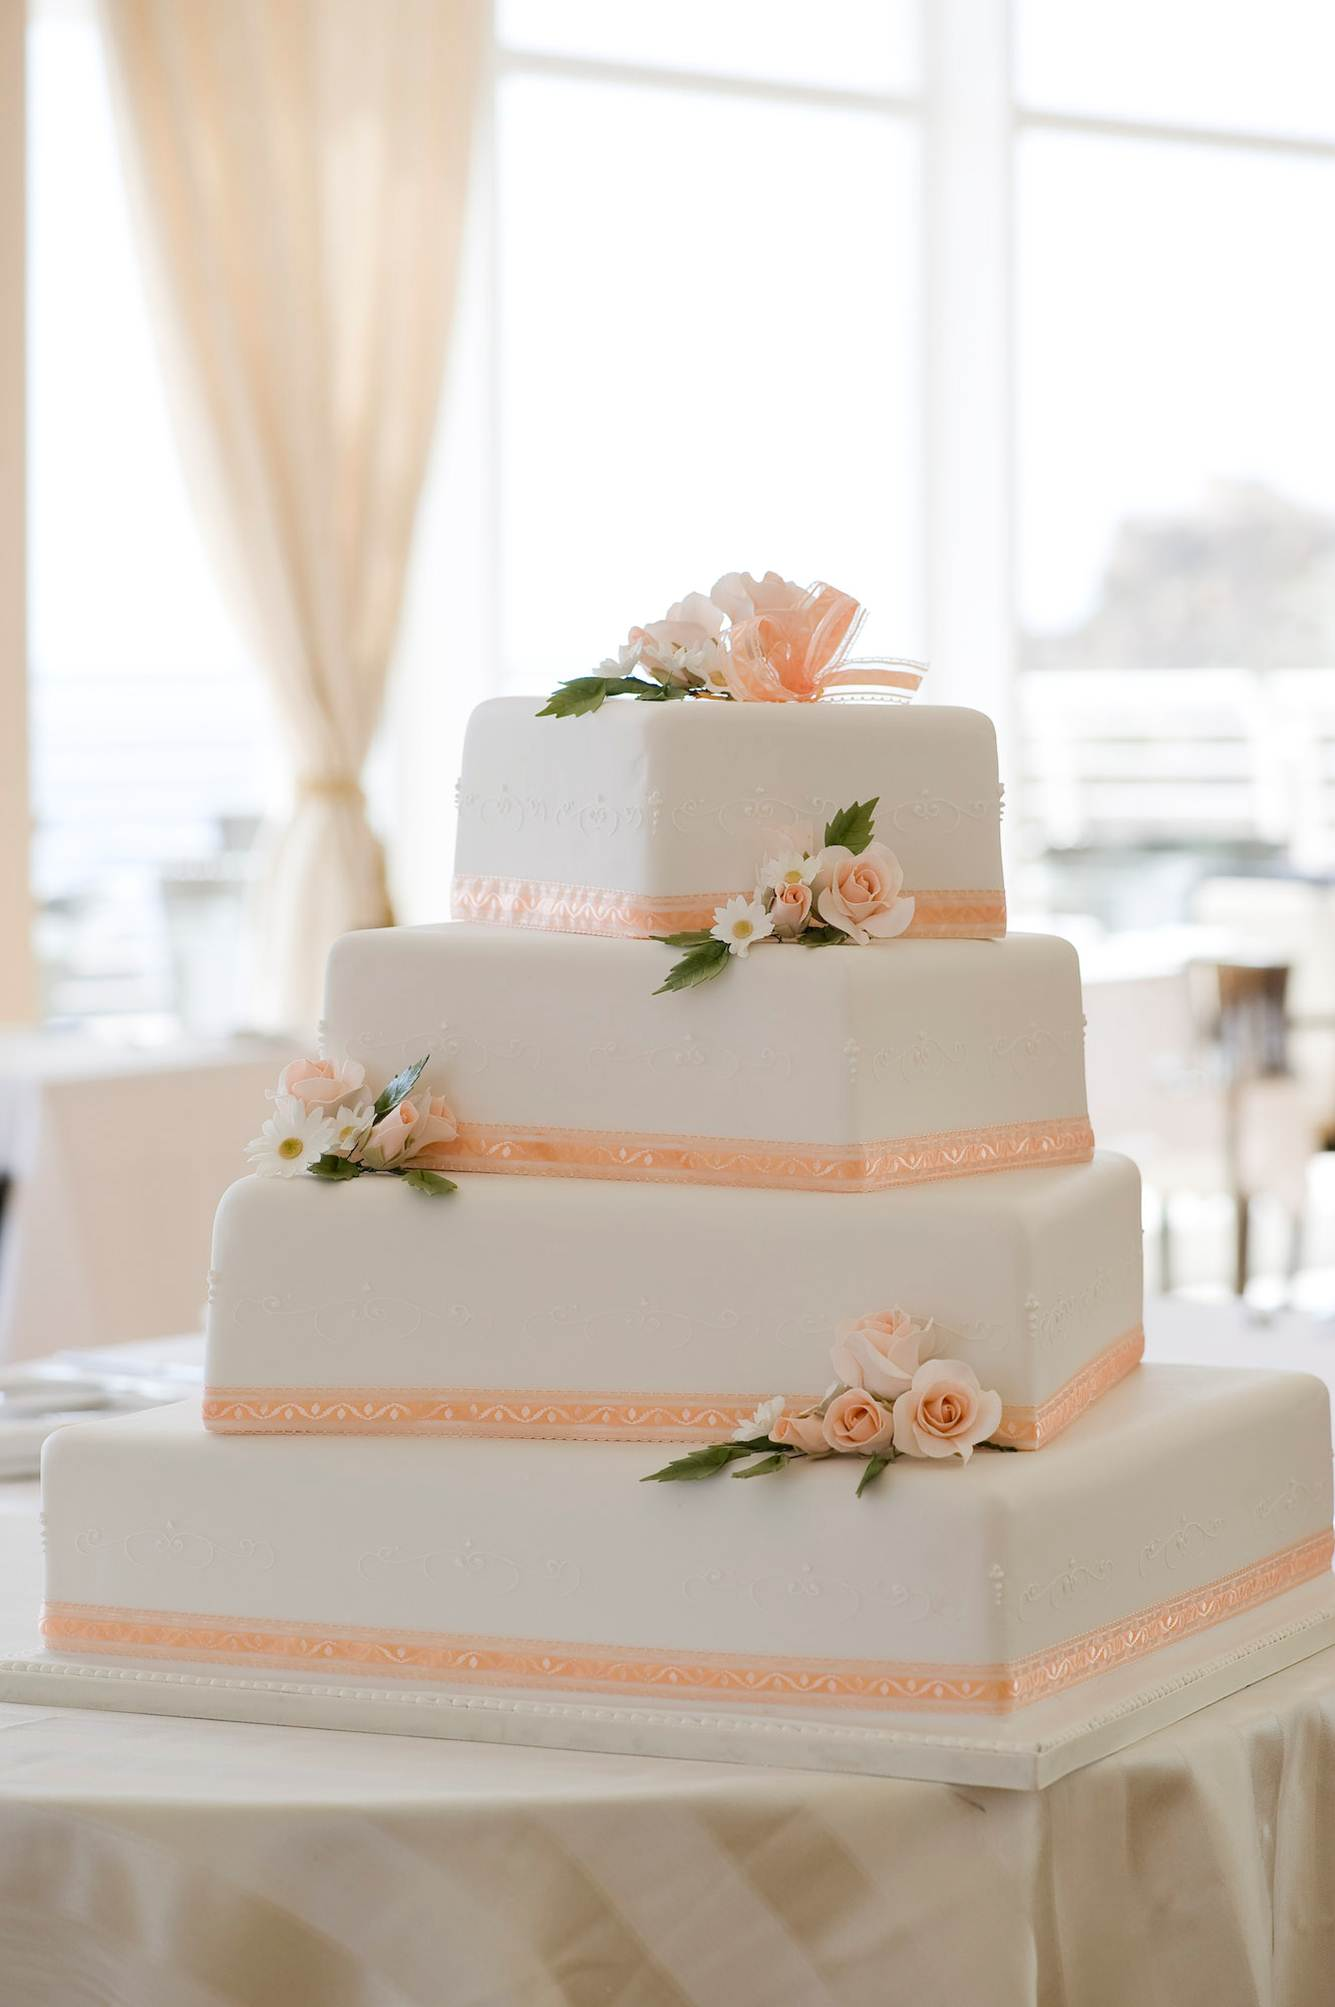 Weddings in Malta – UK Wedding Planner in Malta Weddings